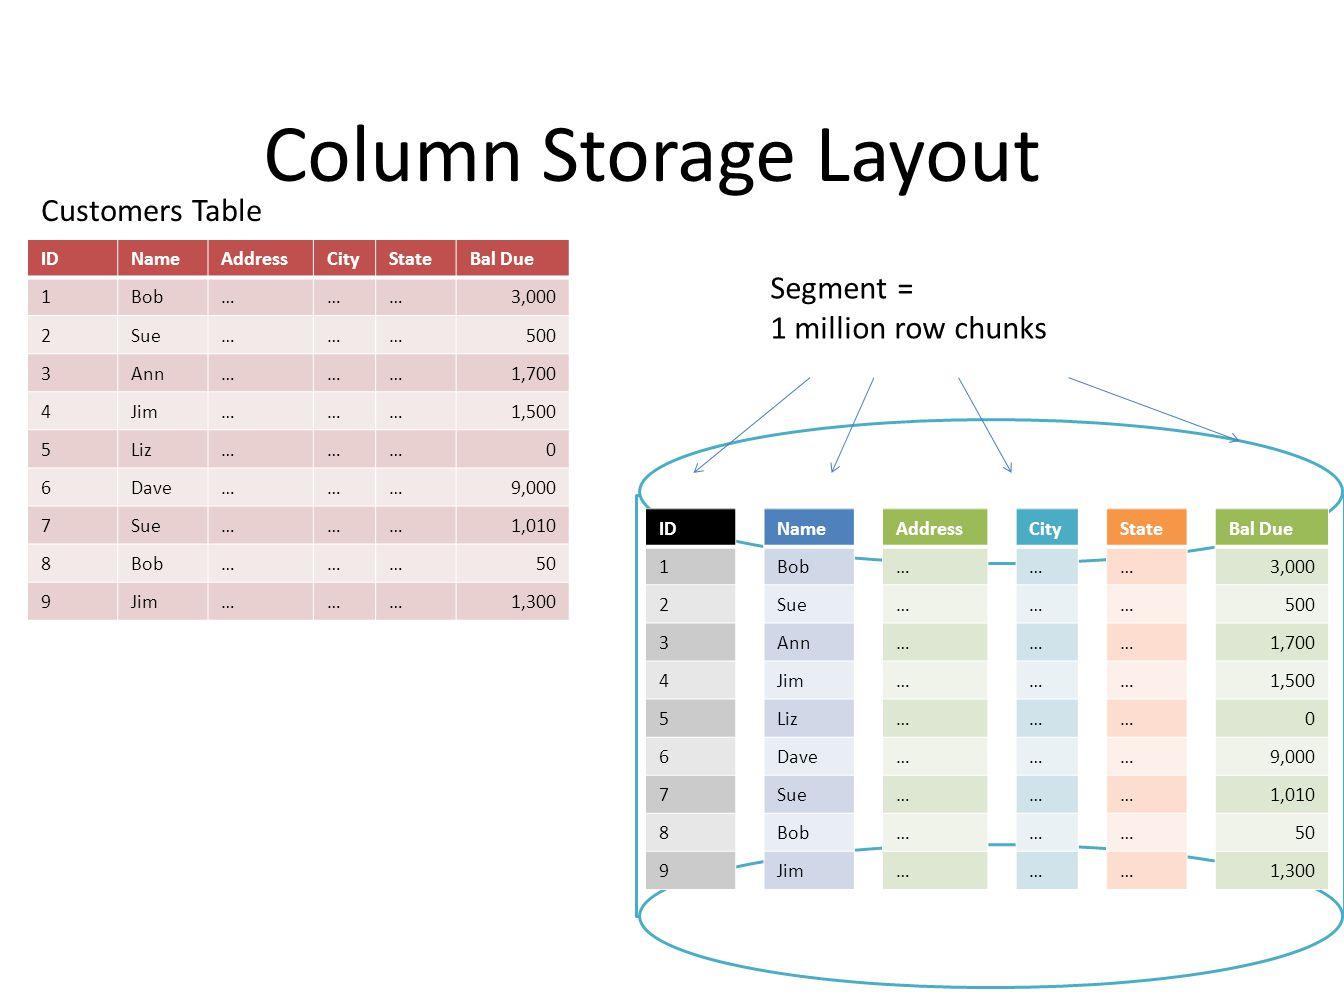 Column Storage Layout IDNameAddressCityStateBal Due 1Bob………3,000 2Sue………500 3Ann………1,700 4Jim………1,500 5Liz………0 6Dave………9,000 7Sue………1,010 8Bob………50 9J